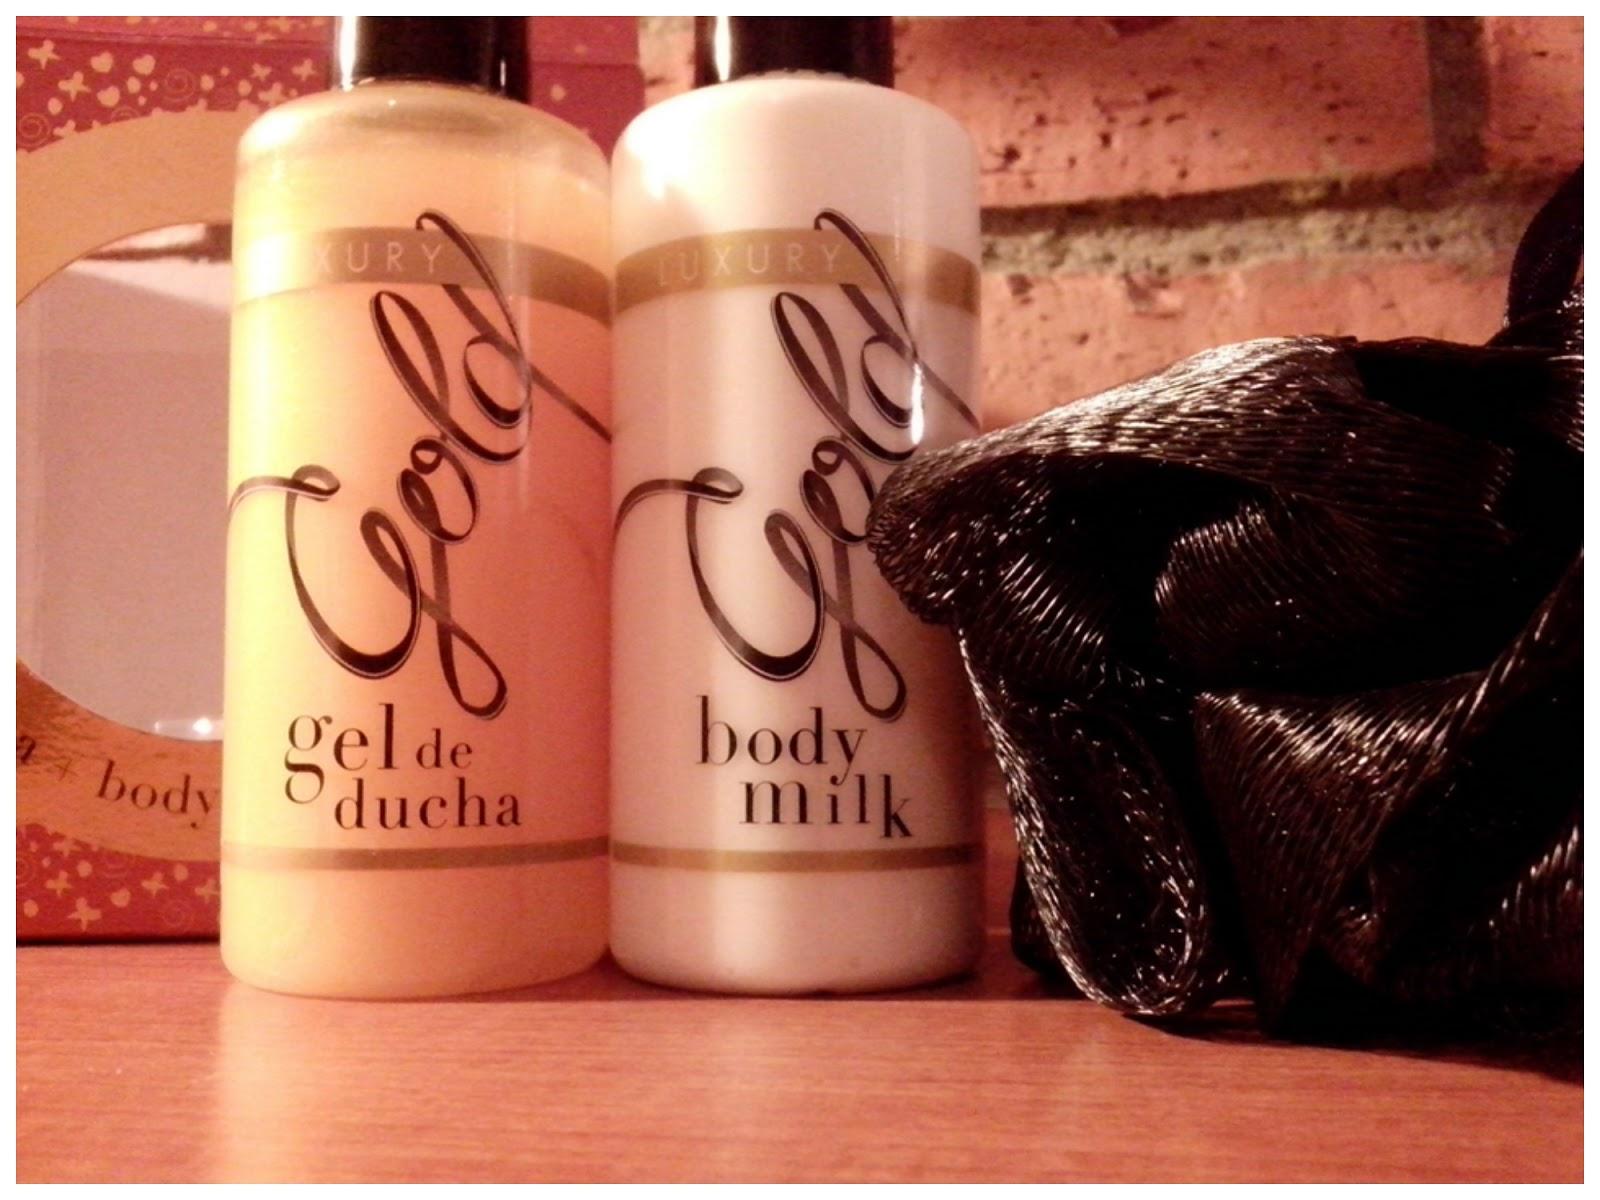 Deliplus gel ducha body milk